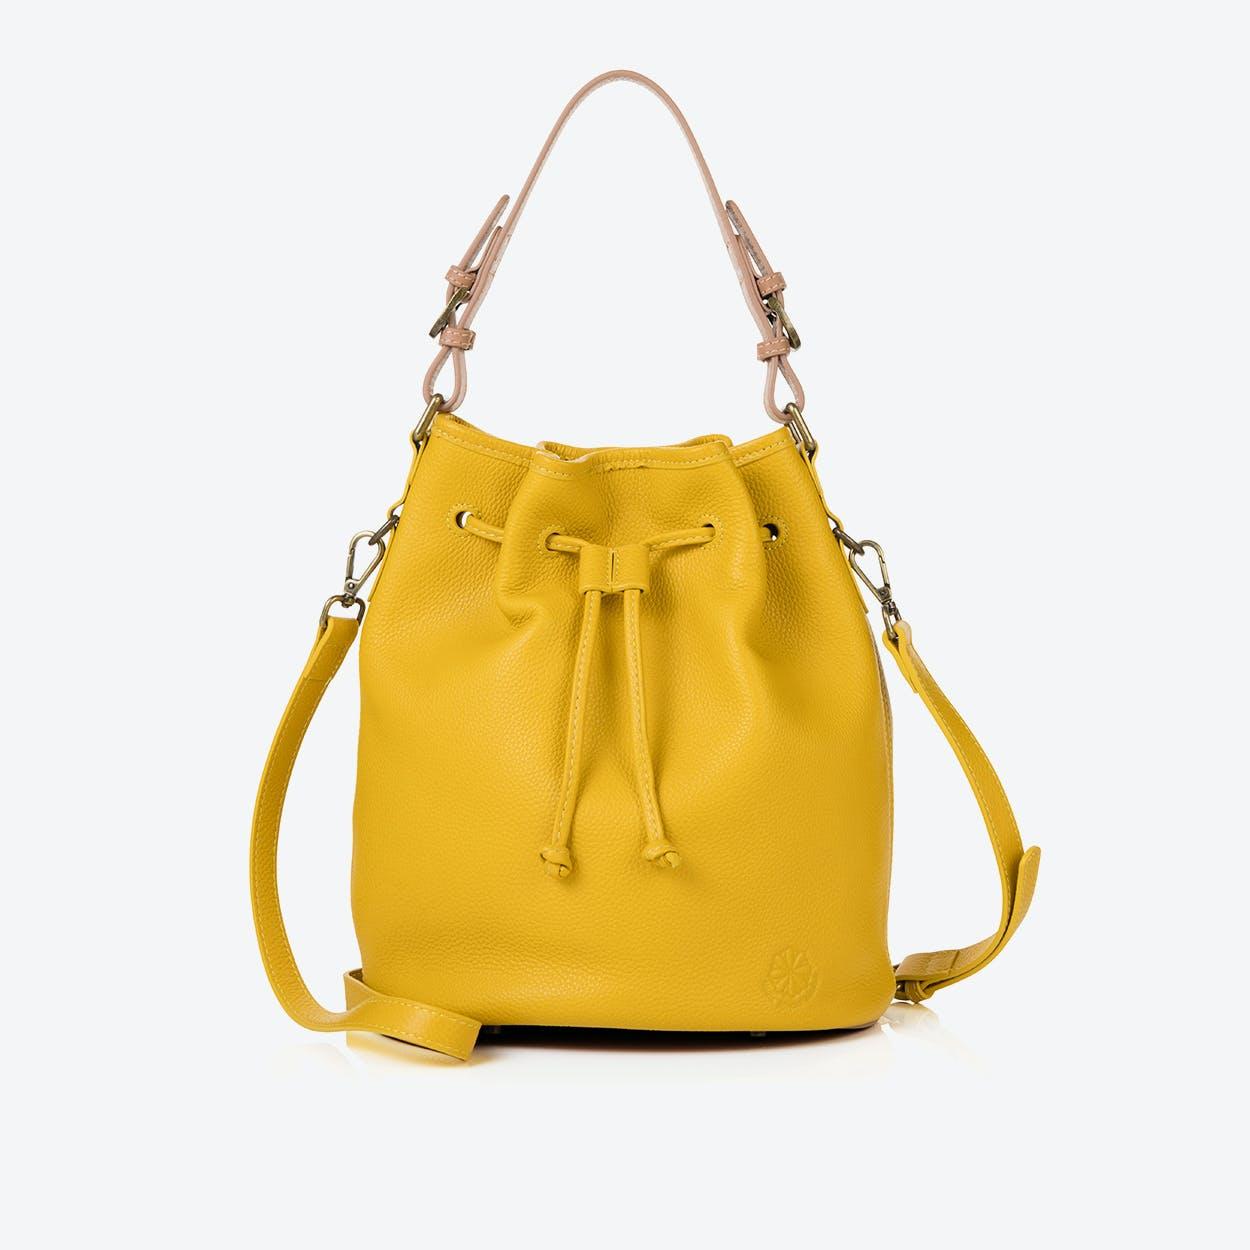 Islington Bucket Bag in Mustard